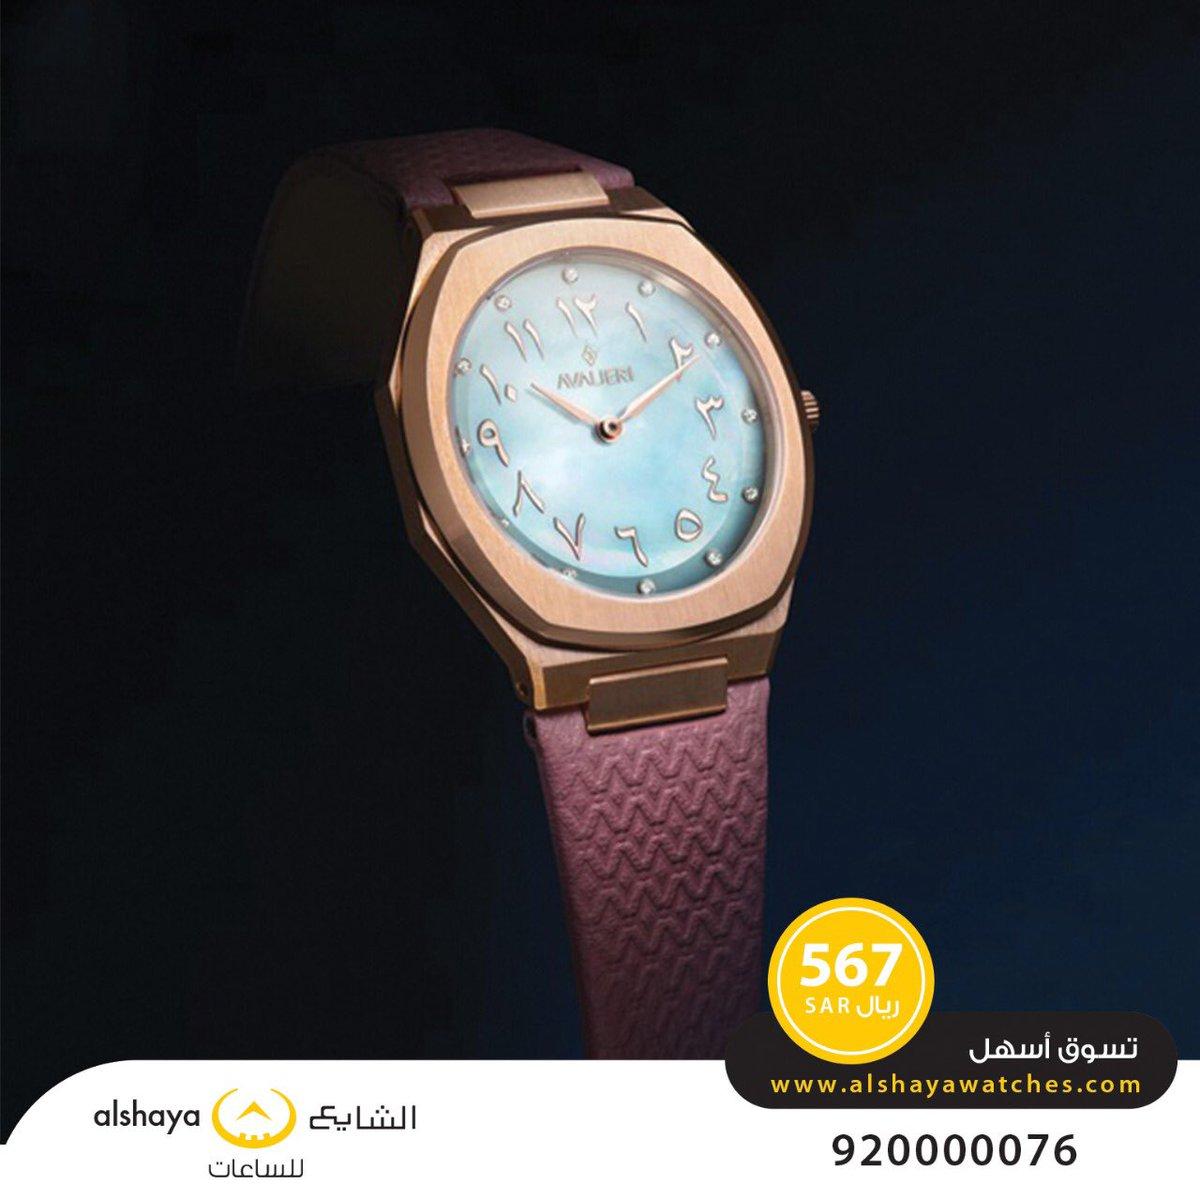 c18164124 تسوق الآن .. https://alshayawatches.com/ar/products/avalieri-tosca-ladies- watch-av-2219b …pic.twitter.com/Ce0eaJ3ywT